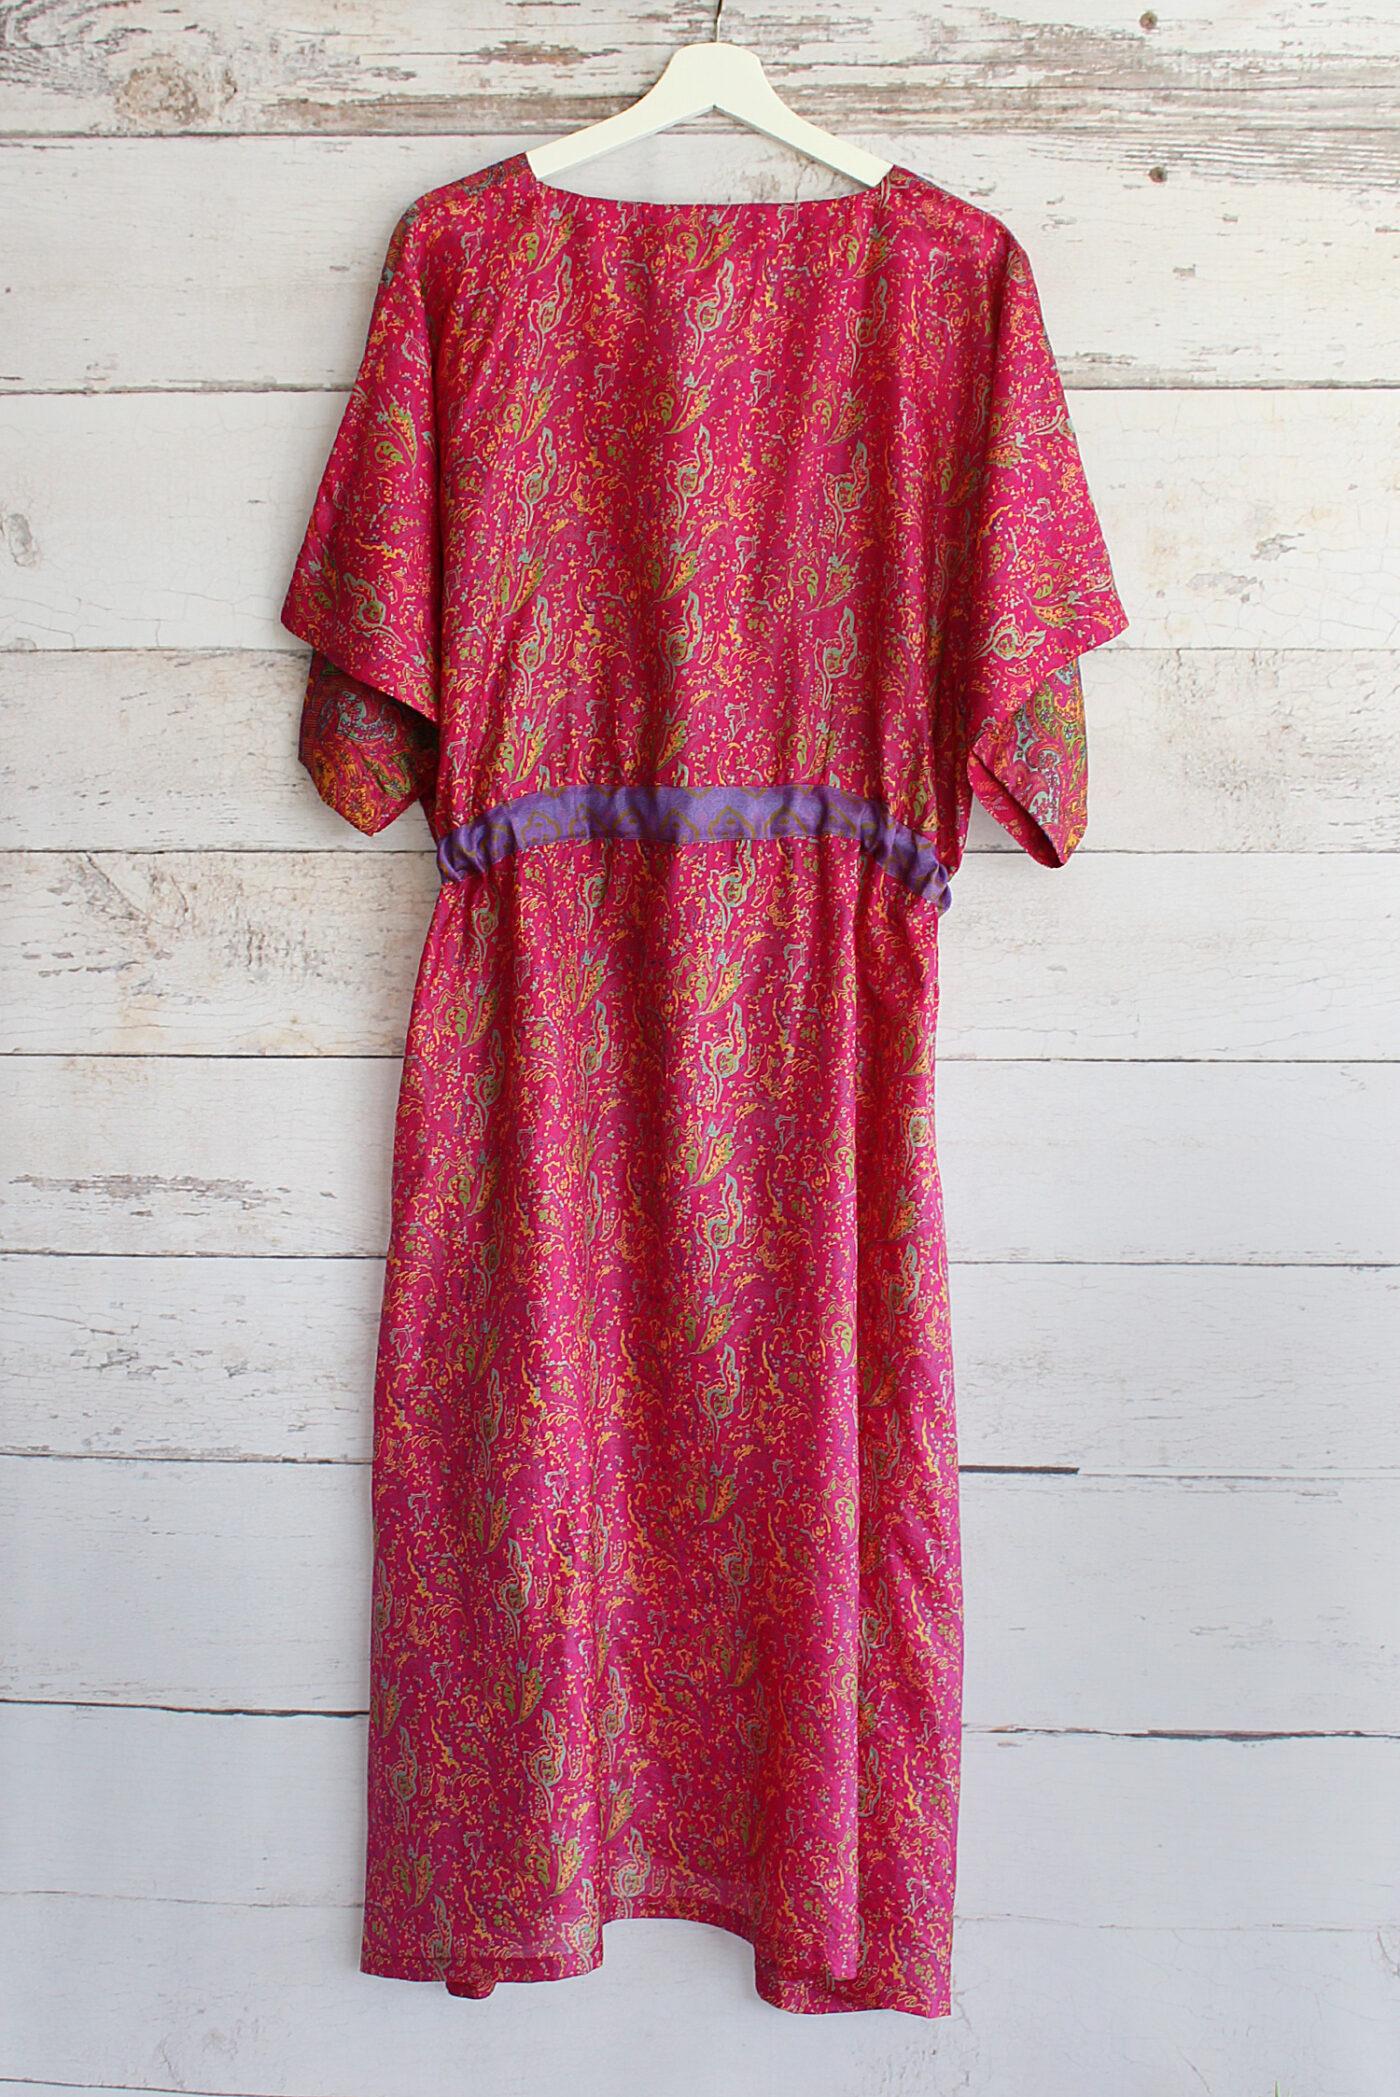 Jacinda Recycled Silk Sari Print Dress J35